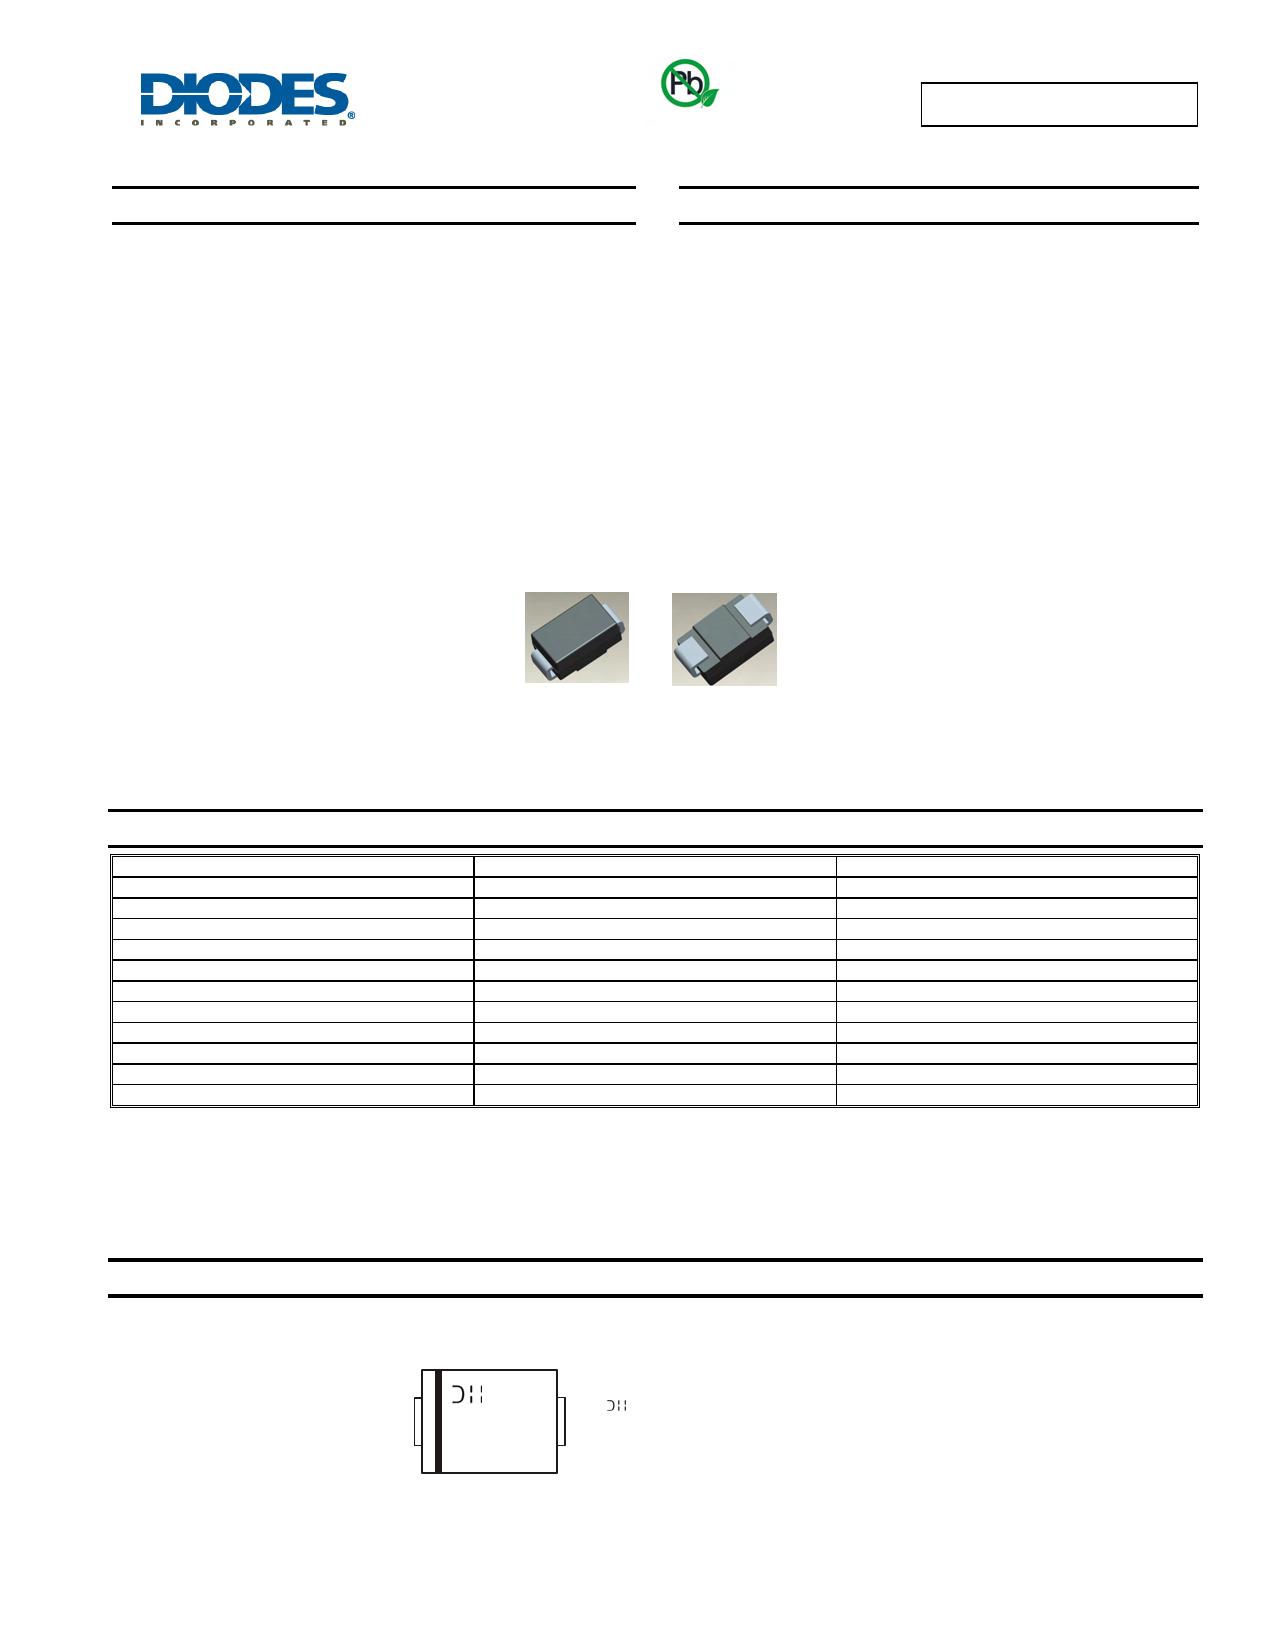 TB1800M datasheet